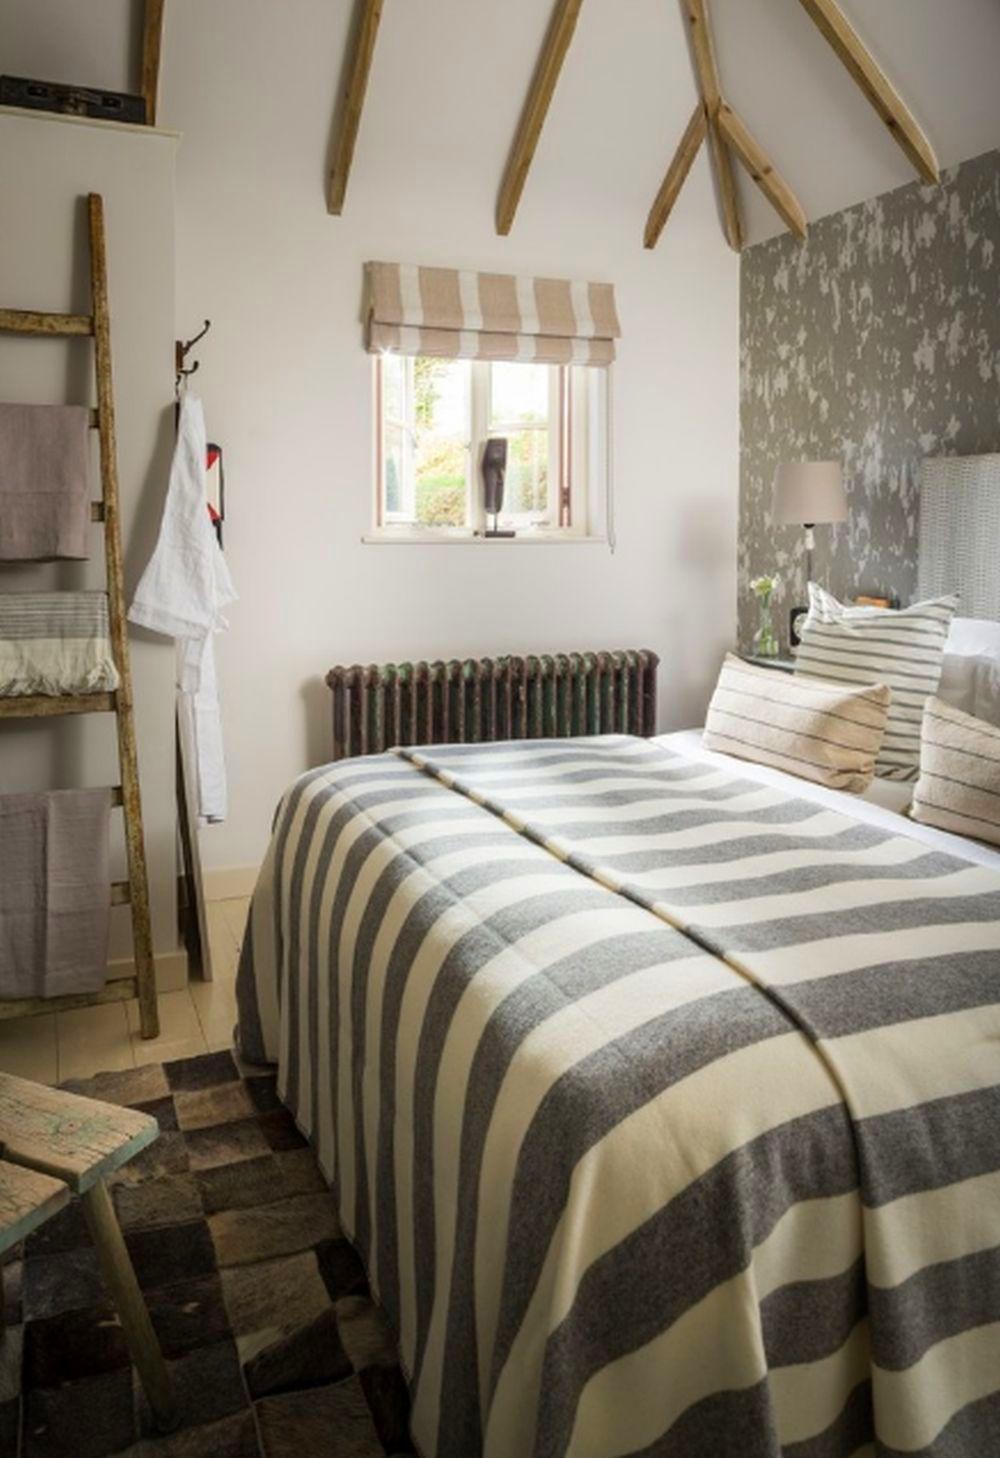 adelaparvu.com despre casa cu acoperis din stuf, casa UK, The Fable, Foto Unique Home Stays (7)